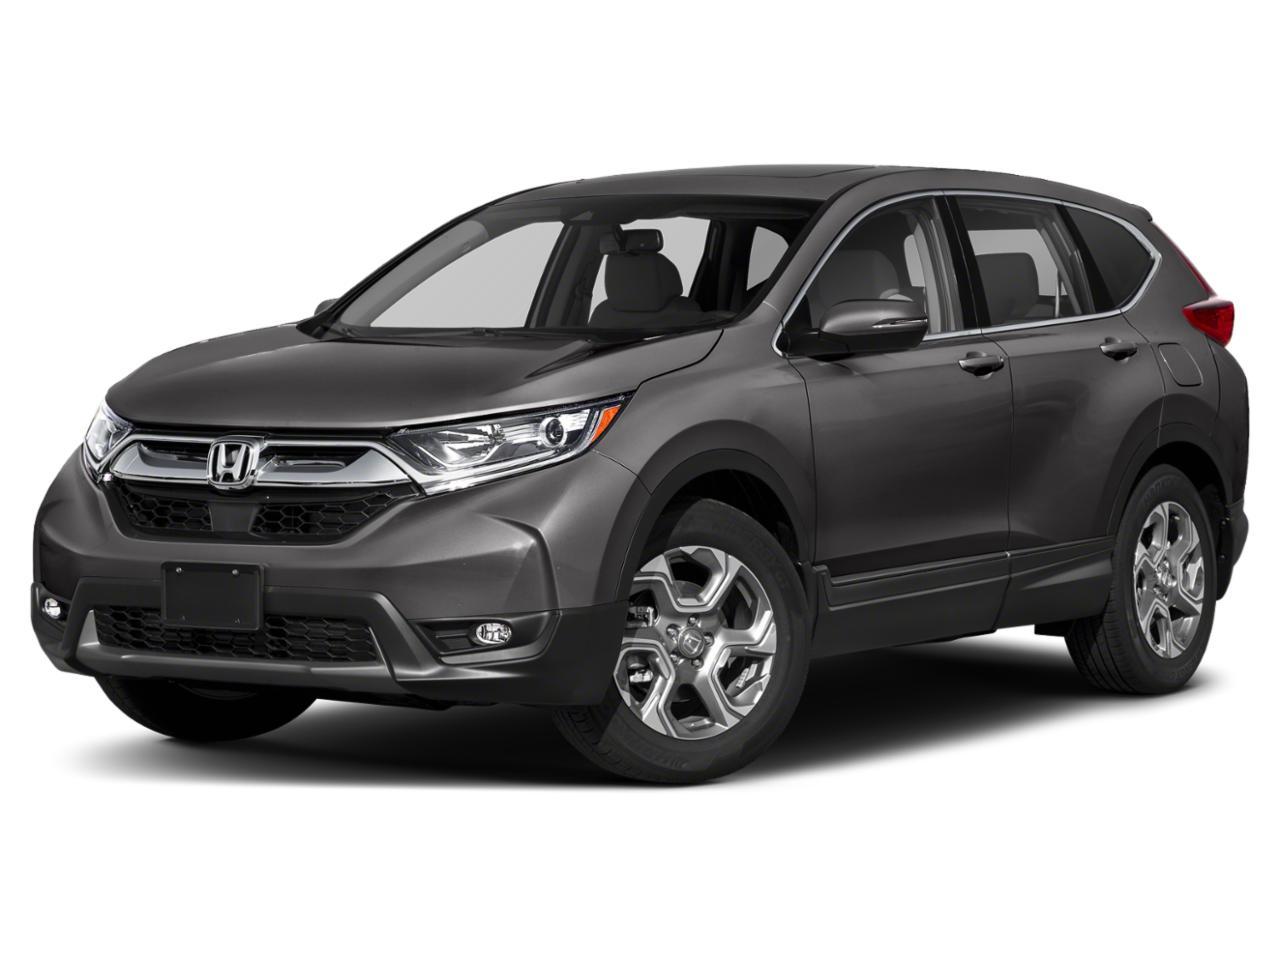 2019 Honda CR-V Vehicle Photo in Corpus Christi, TX 78411